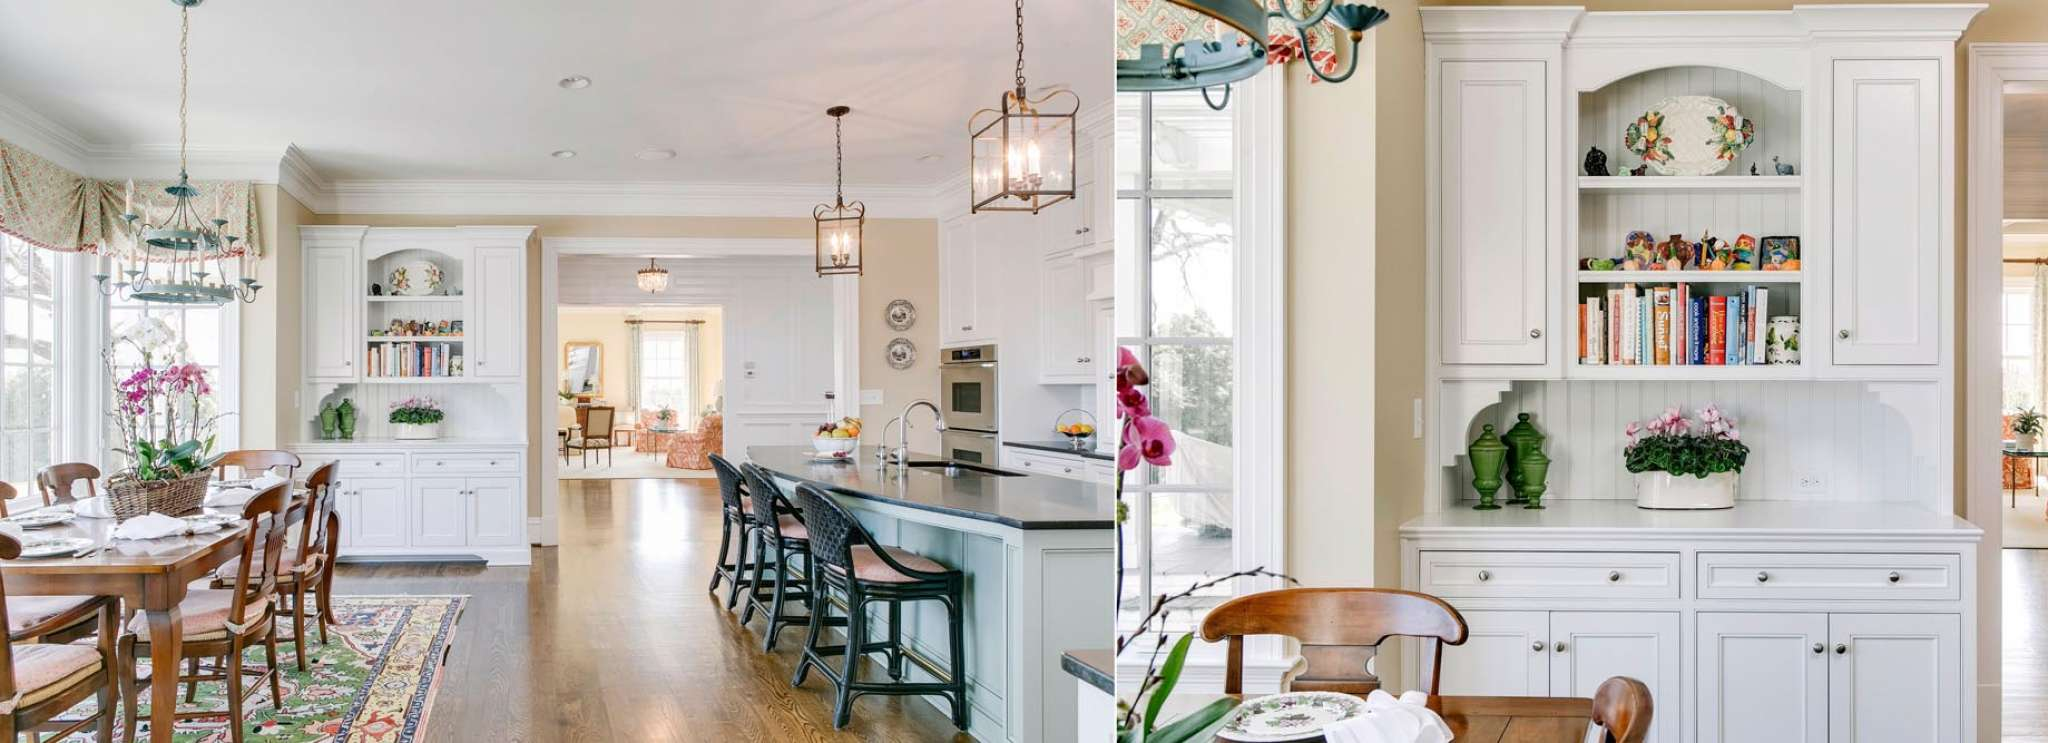 Pally And Southard Interior Design Croasdaile Home